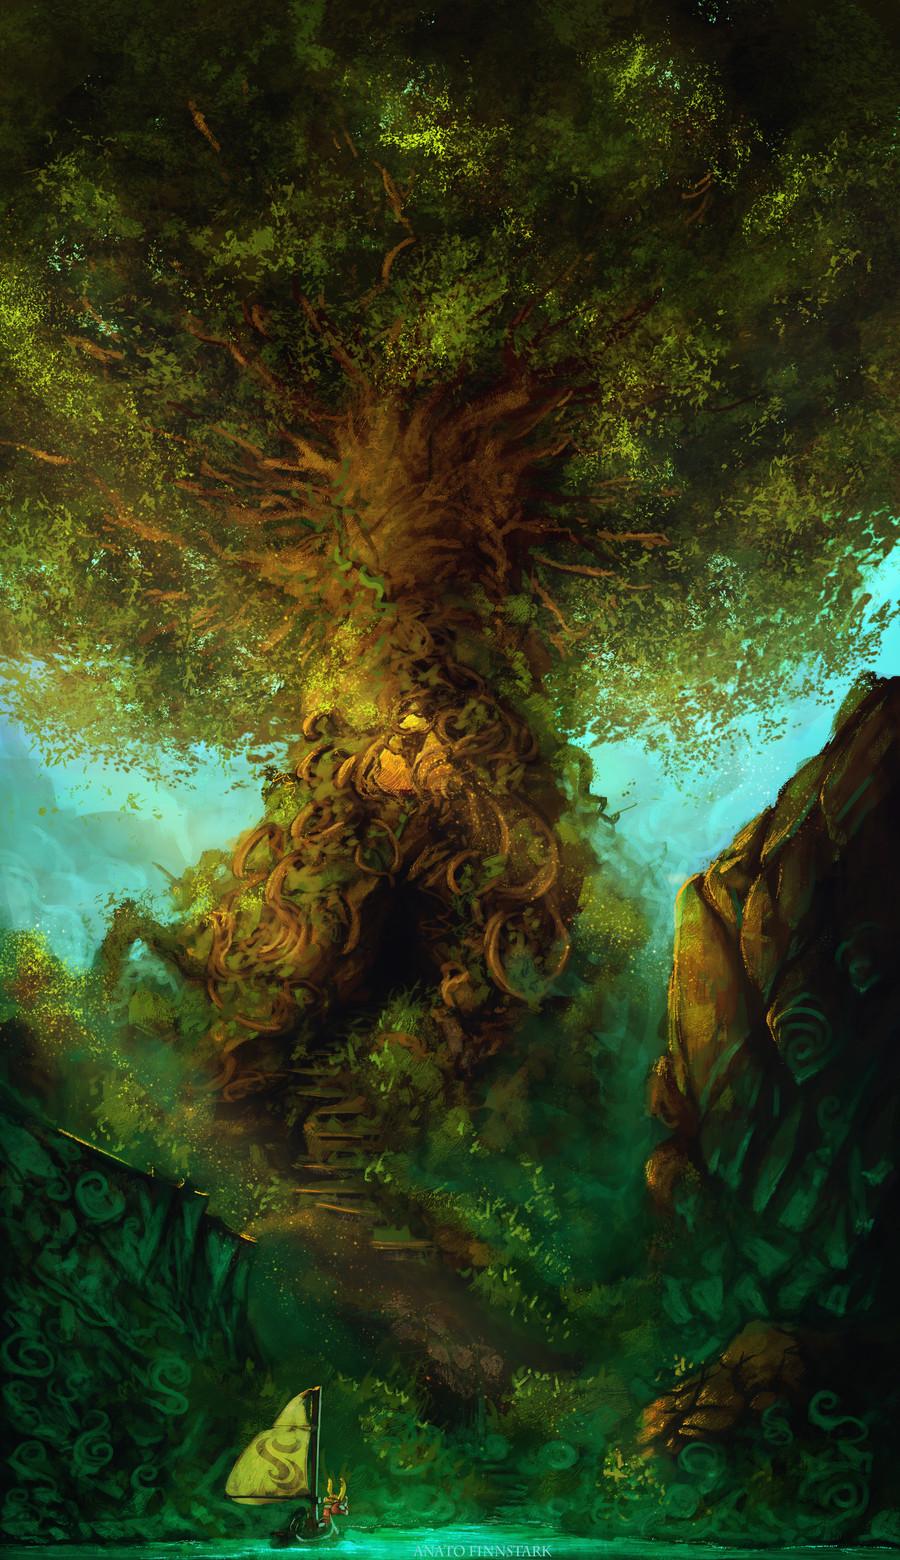 Anato finnstark zelda the wind waker the tree of wisdom by anatofinnstark dc8s8xd